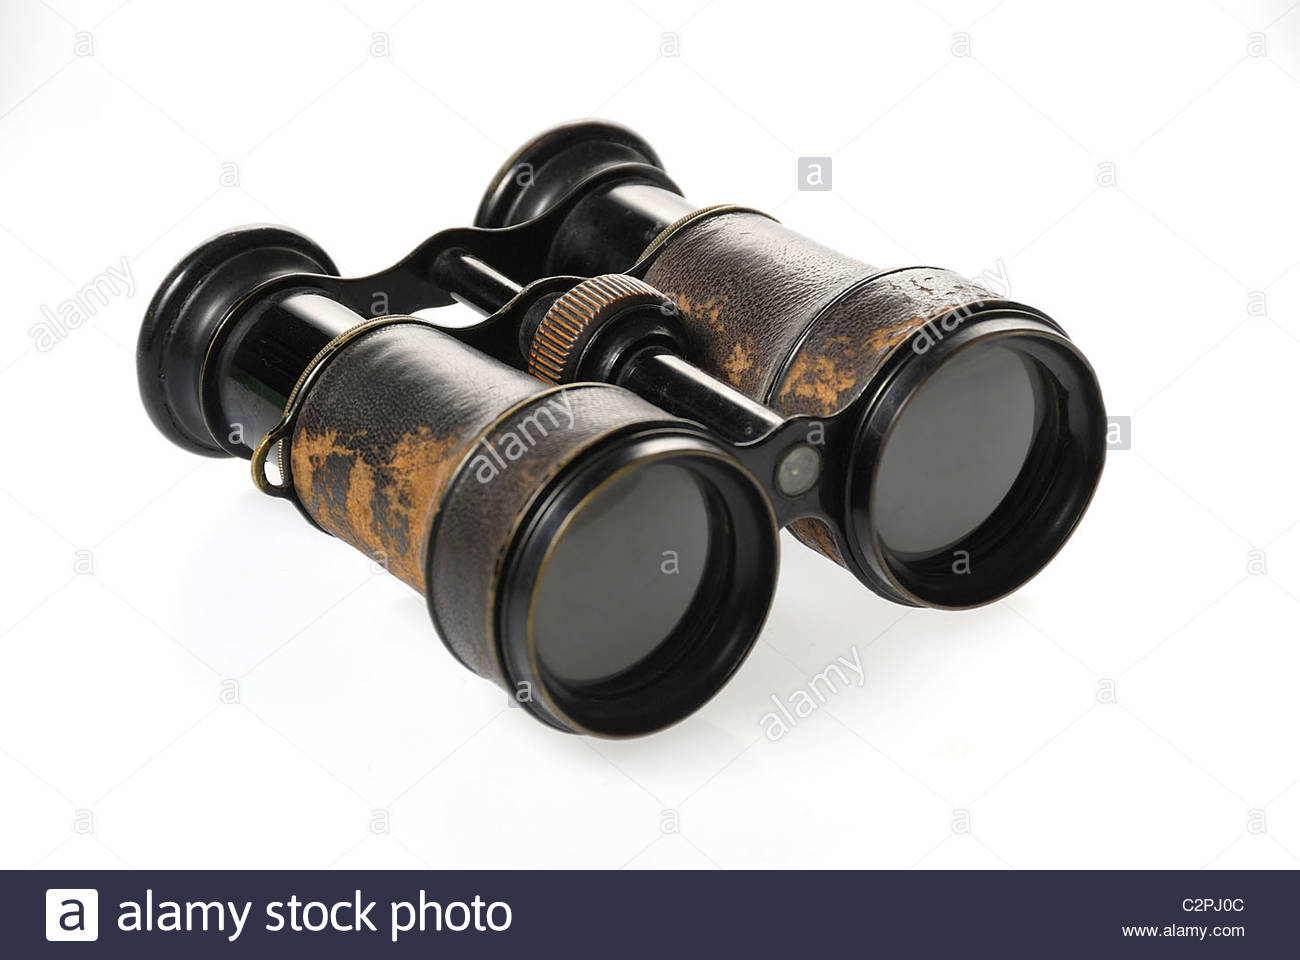 Binoculars historically - Stock Image